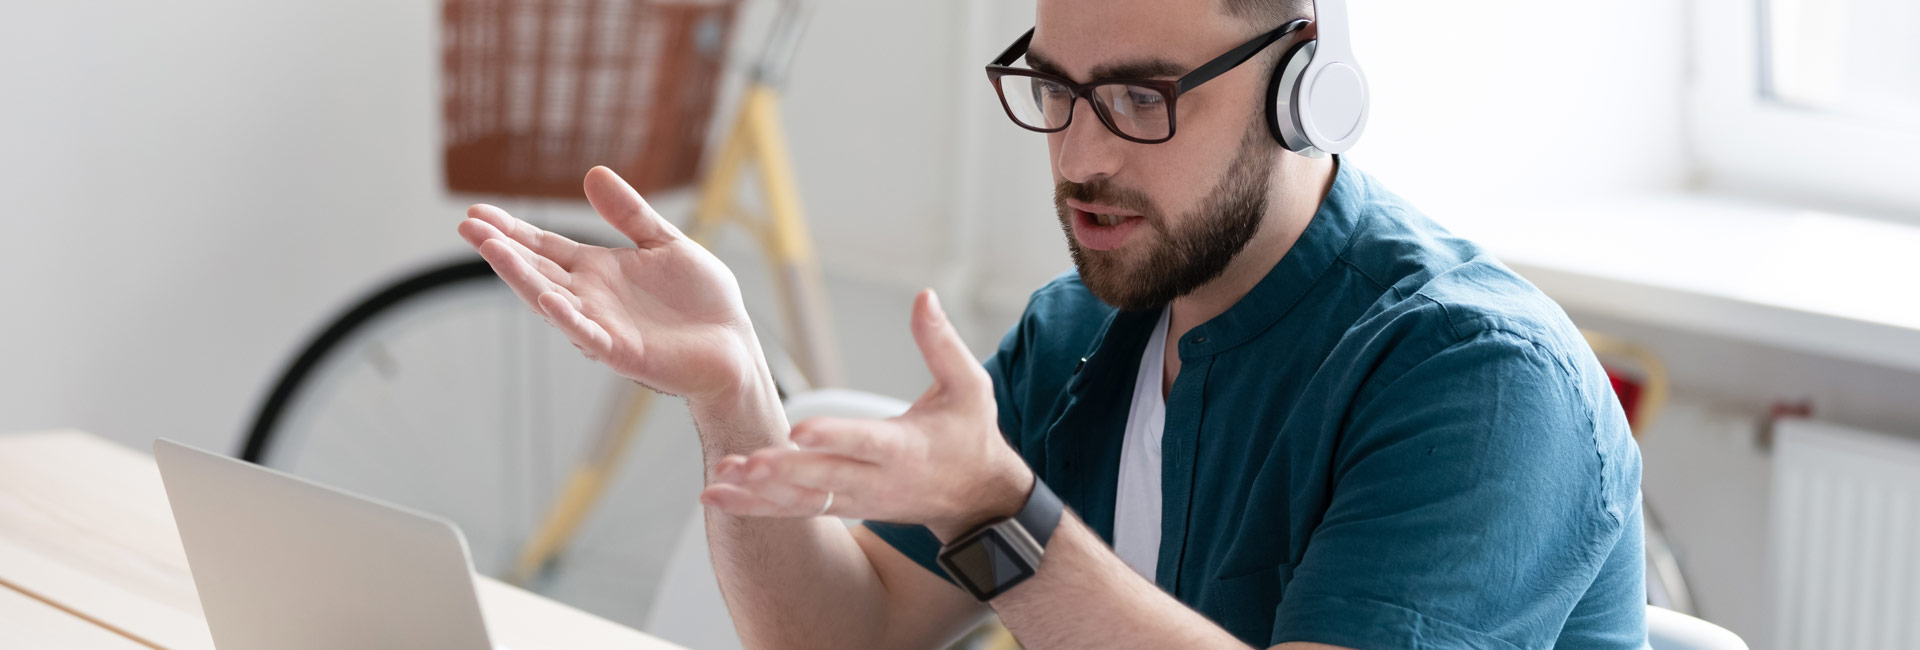 Full Hero - Careers - Smart Working 2